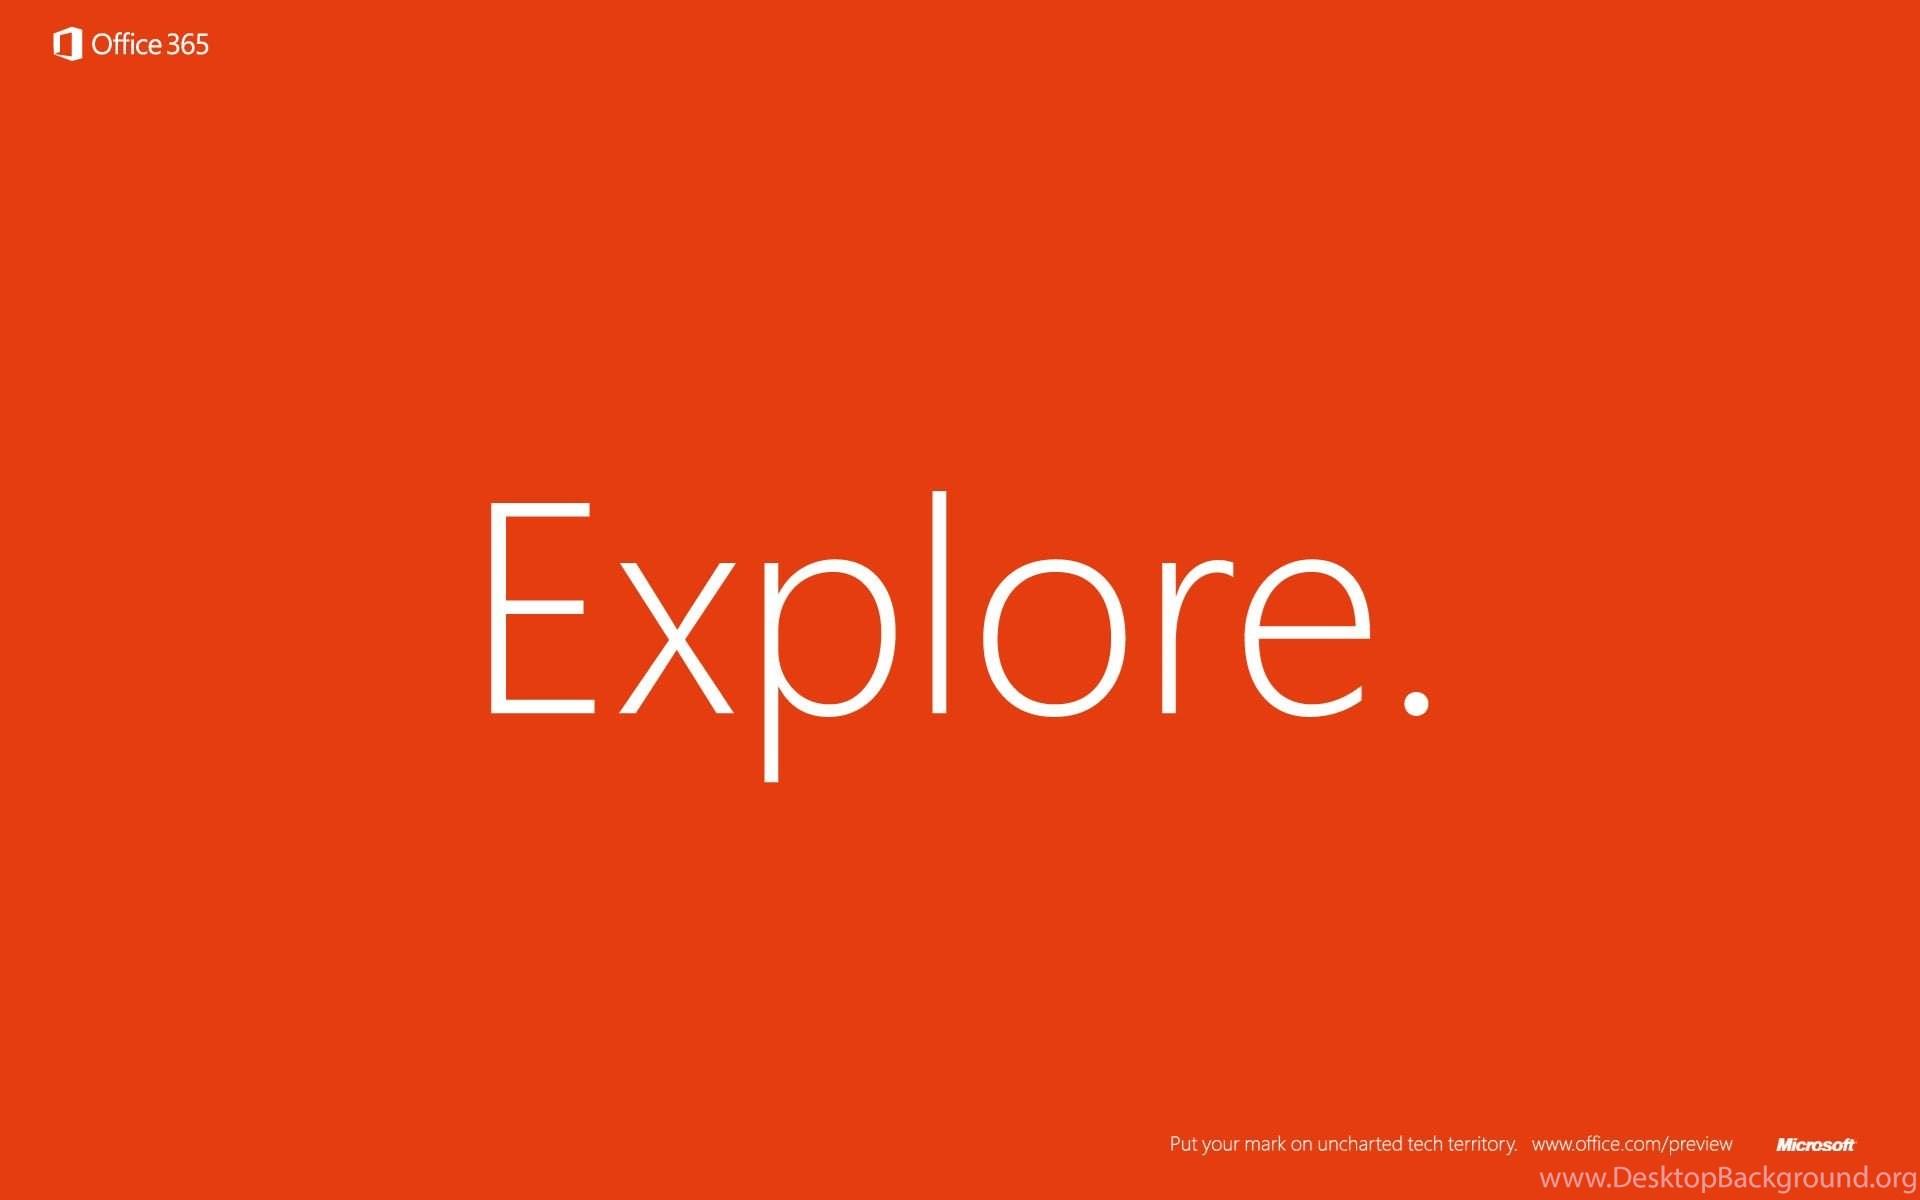 Explore Office 365